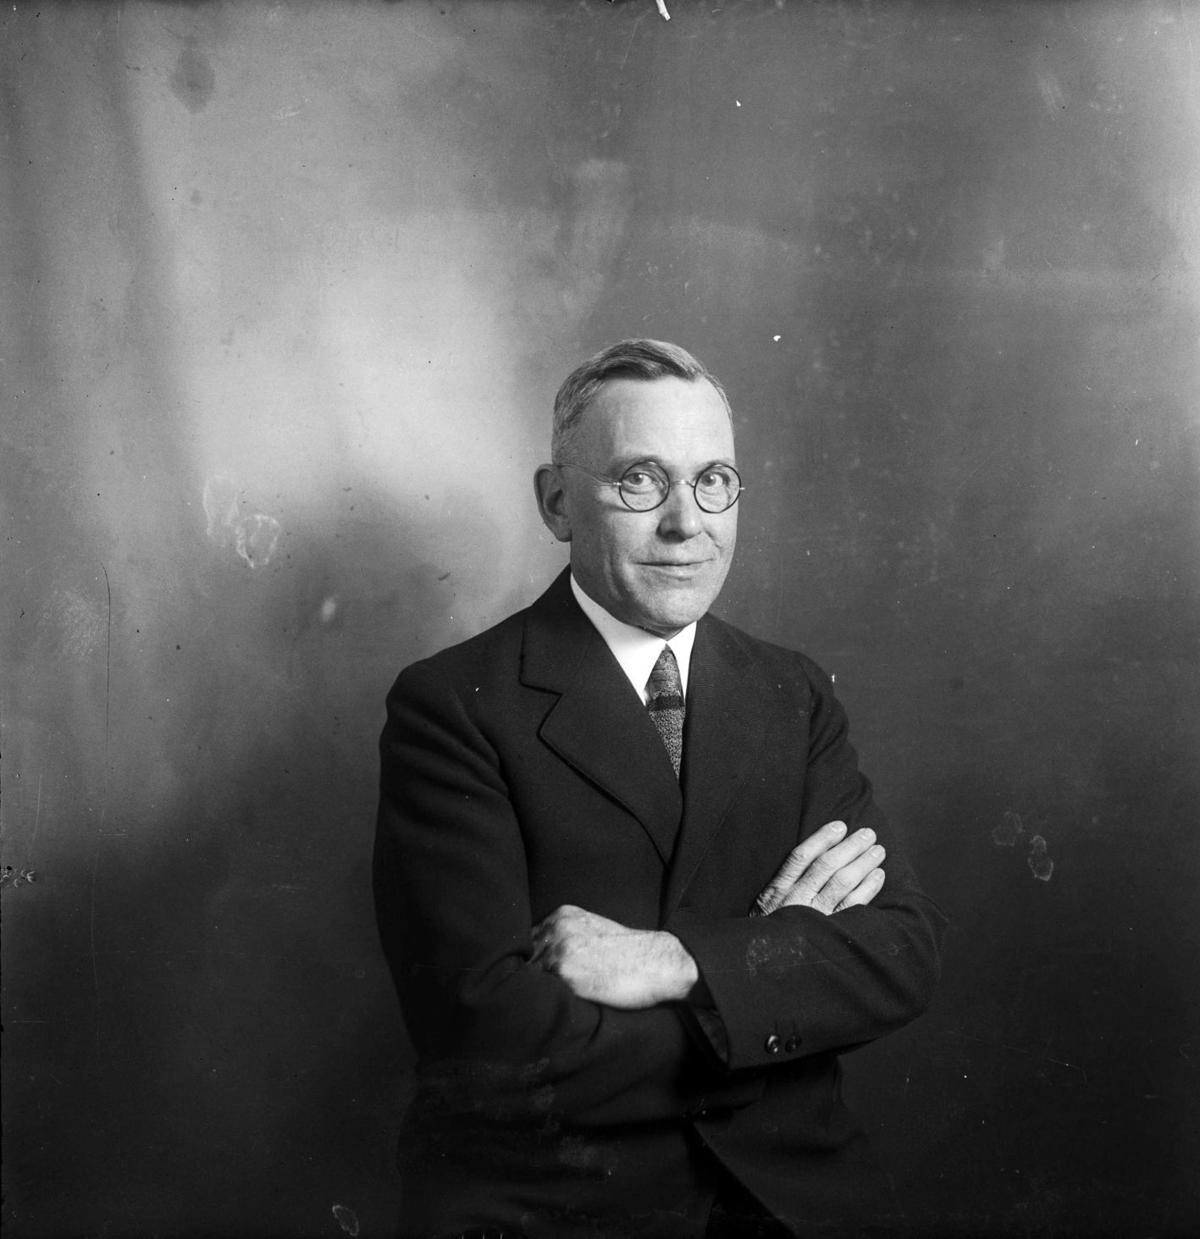 Former Denver Mayor Benjamin F. Stapleton